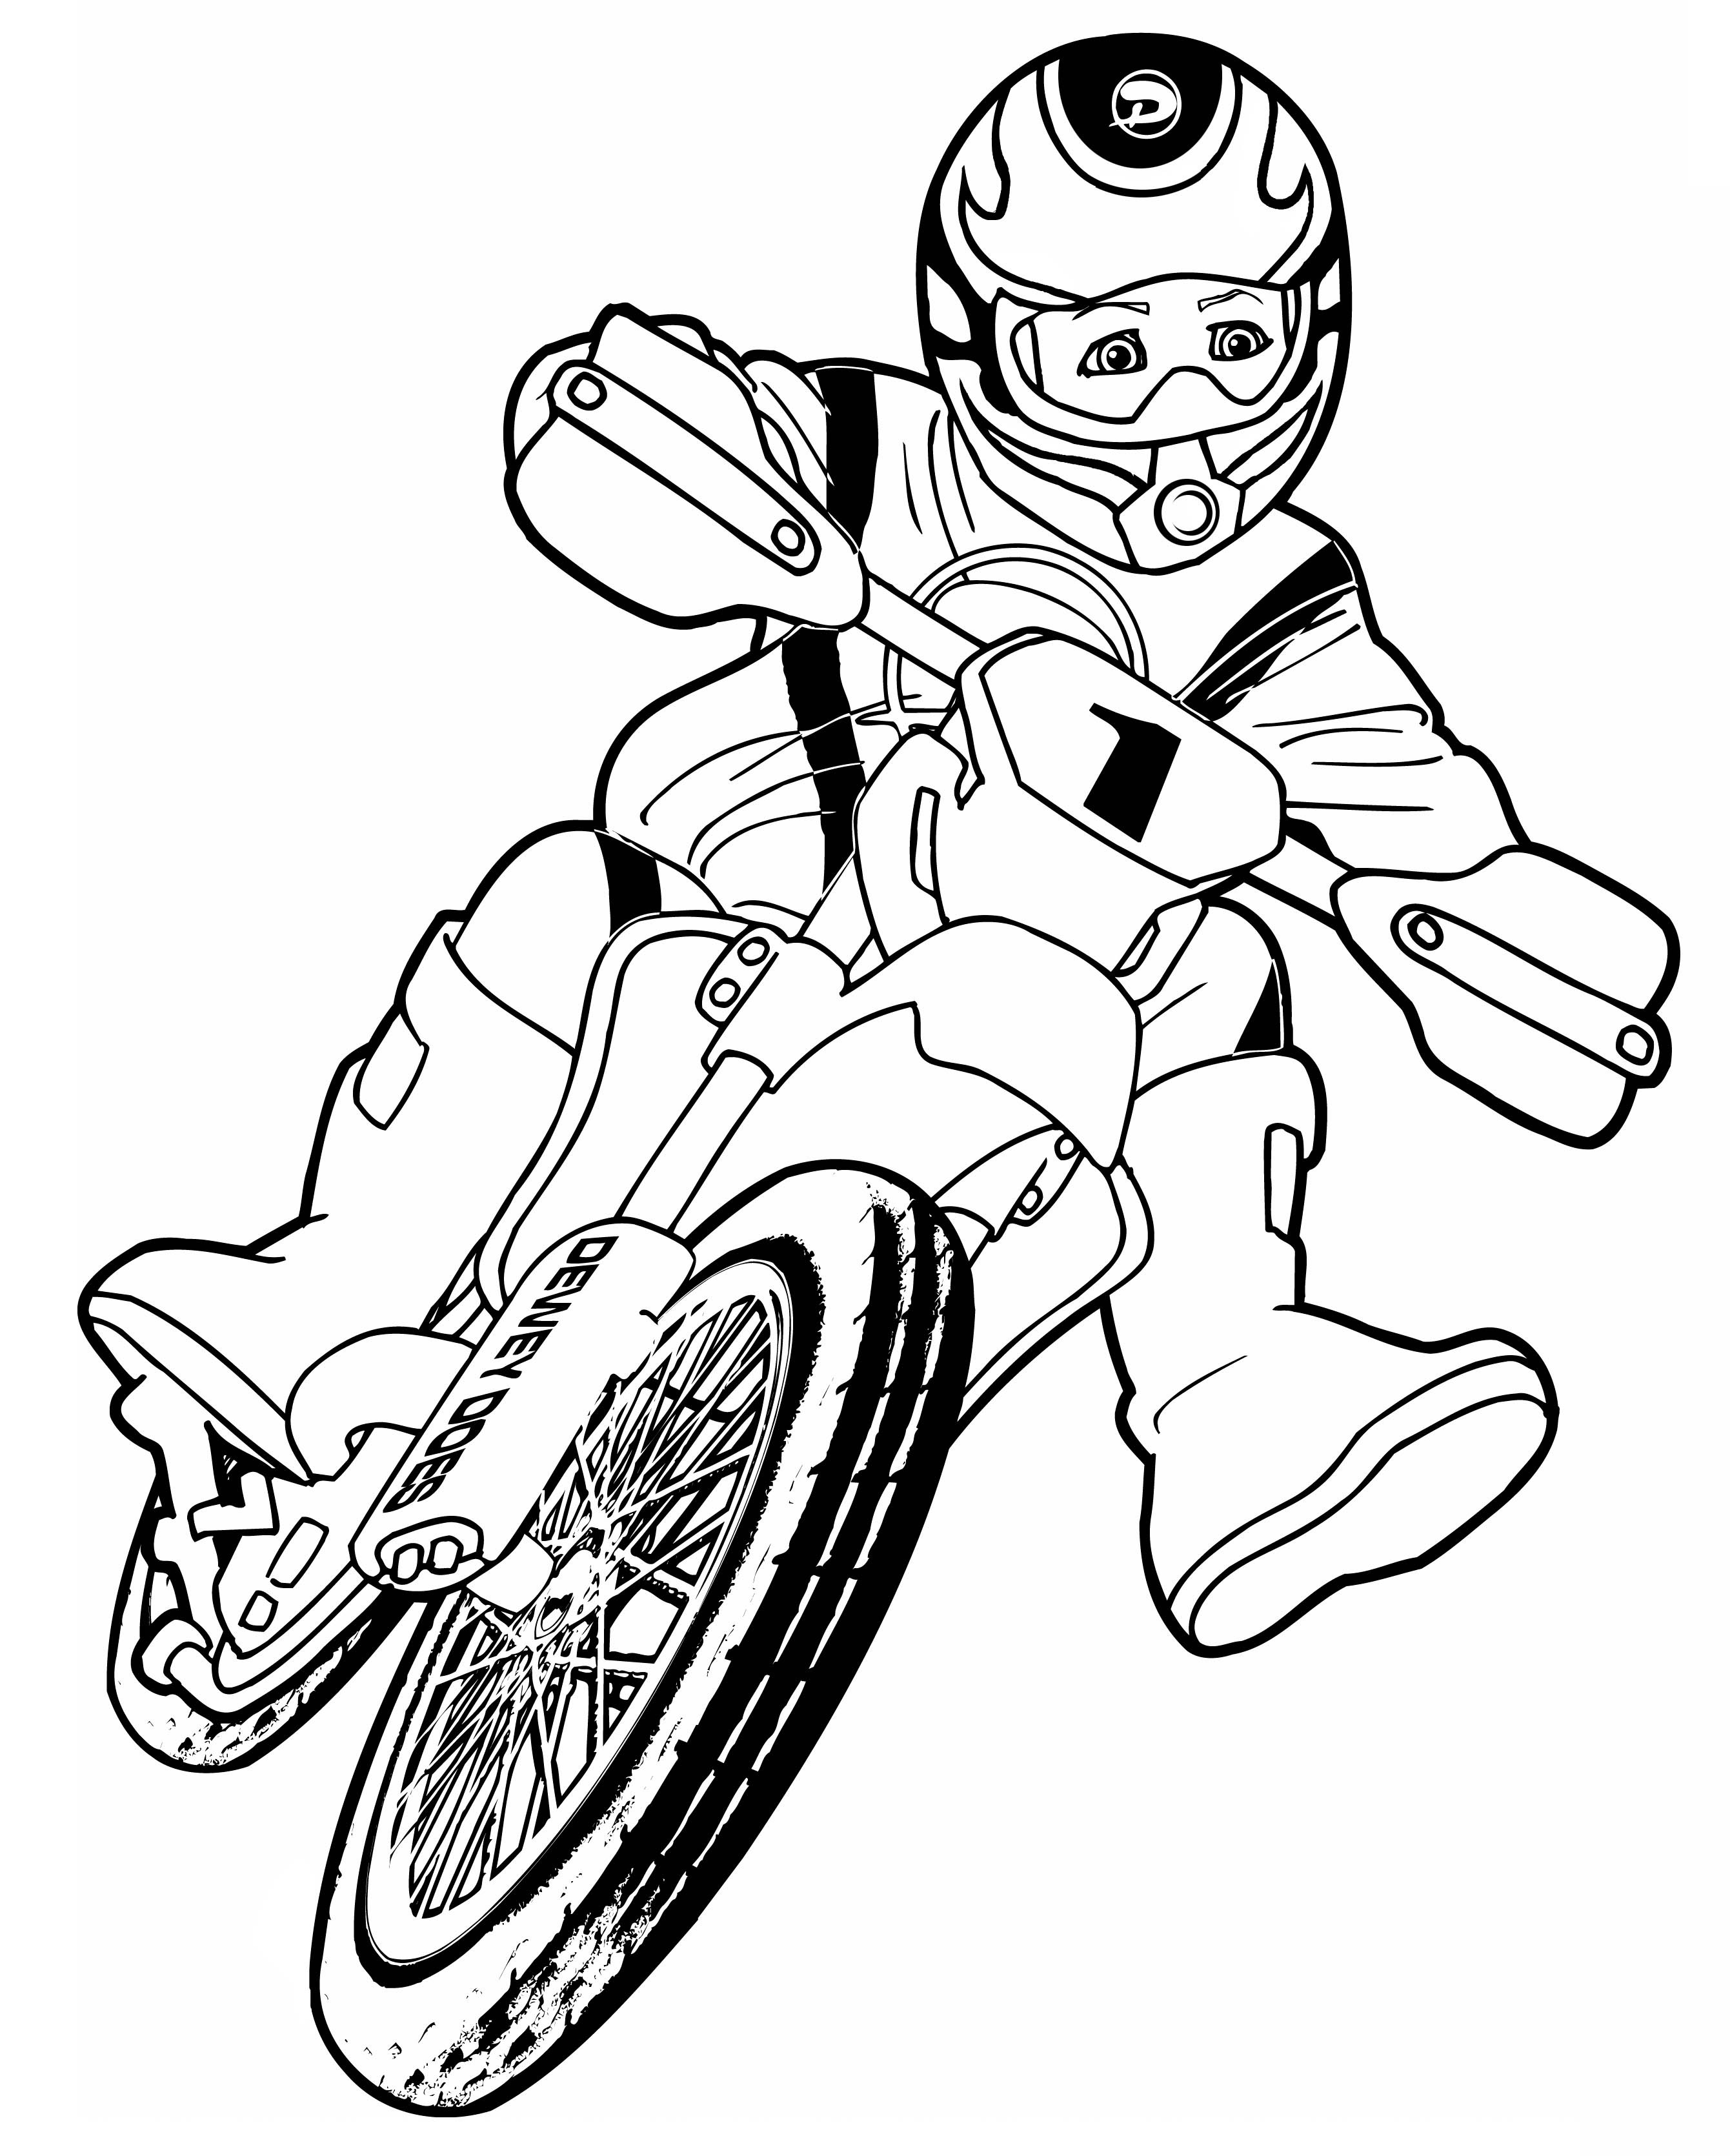 Motocross Ausmalbilder  Malvorlagen fur kinder Ausmalbilder Motocross kostenlos